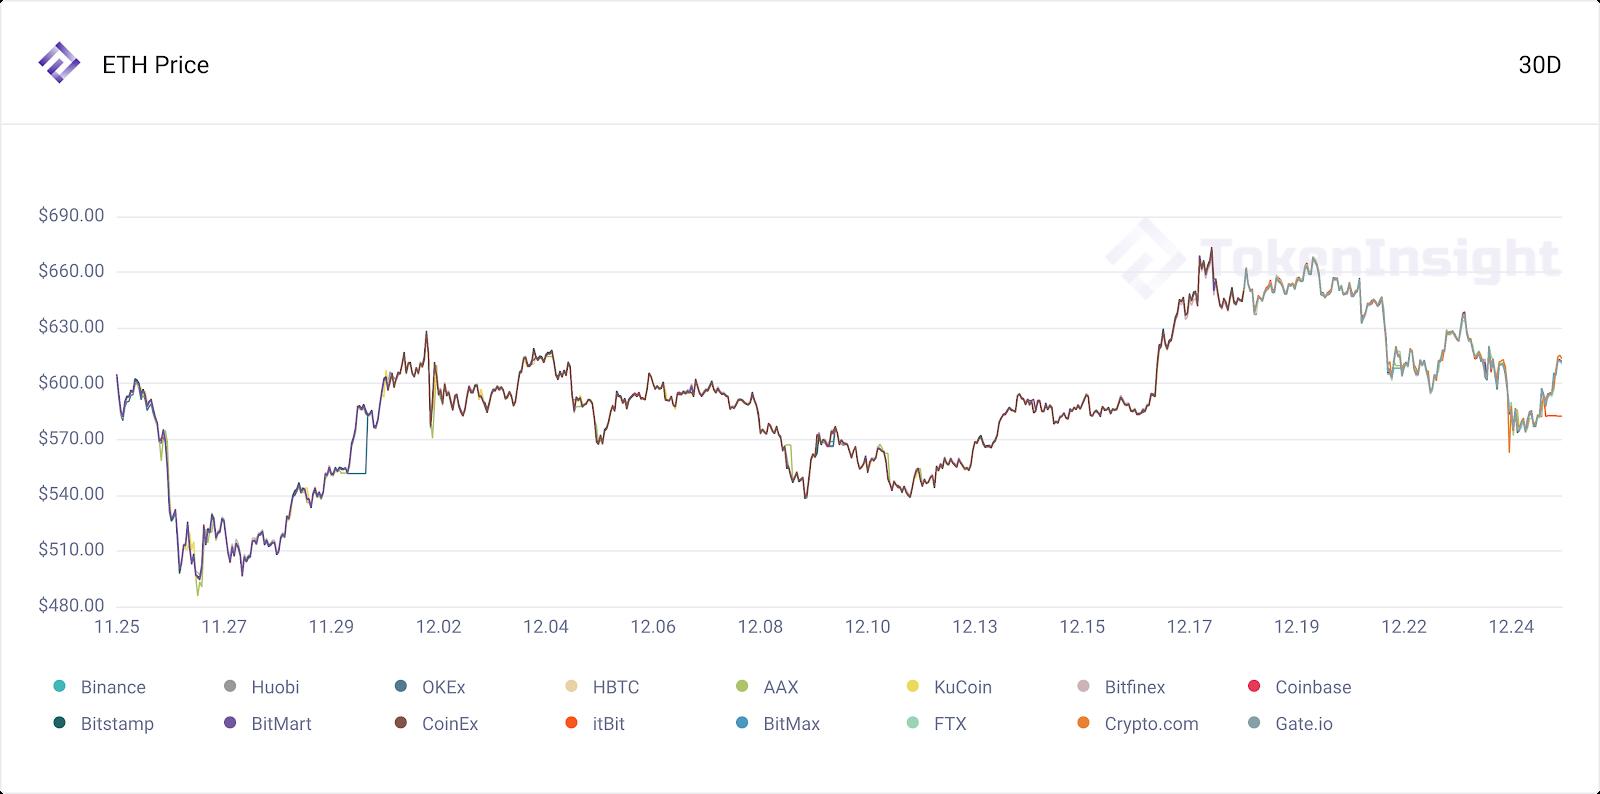 ETH Price - TokenInsight